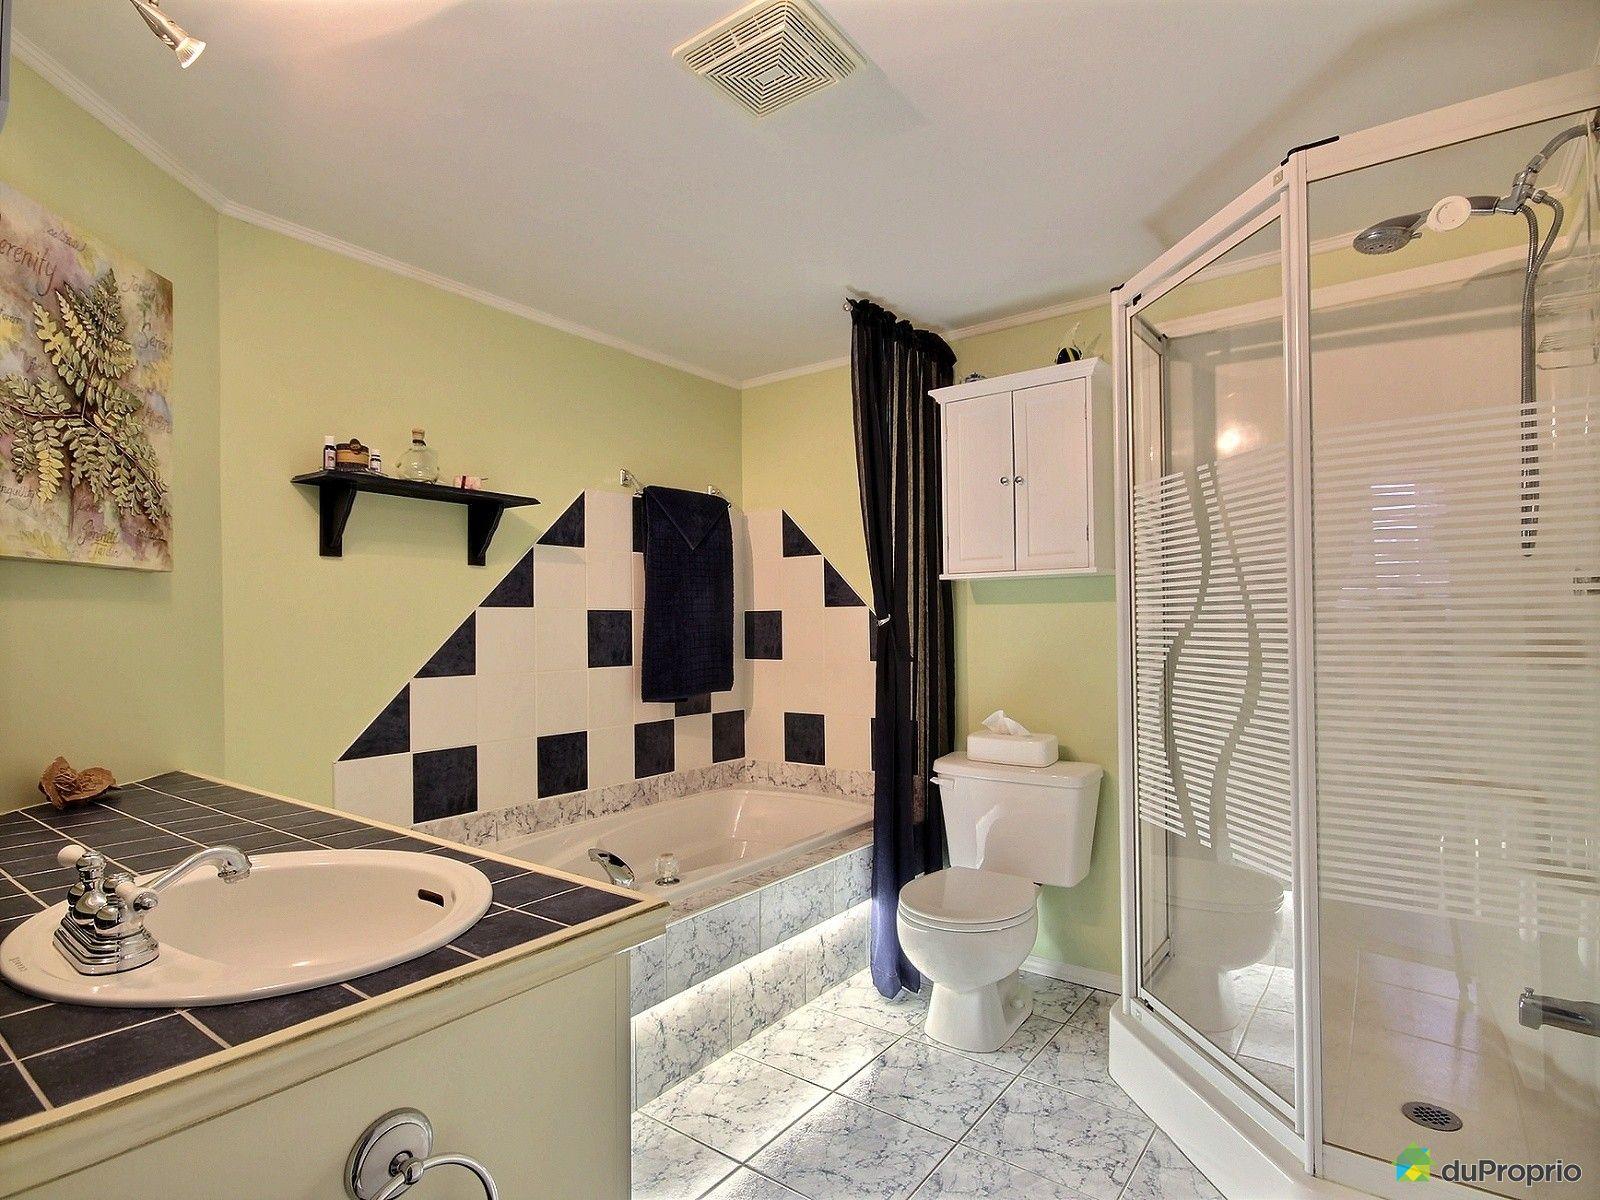 Condo vendre st eustache 101 578 boulevard lavall e for Salle de bain 25 st eustache